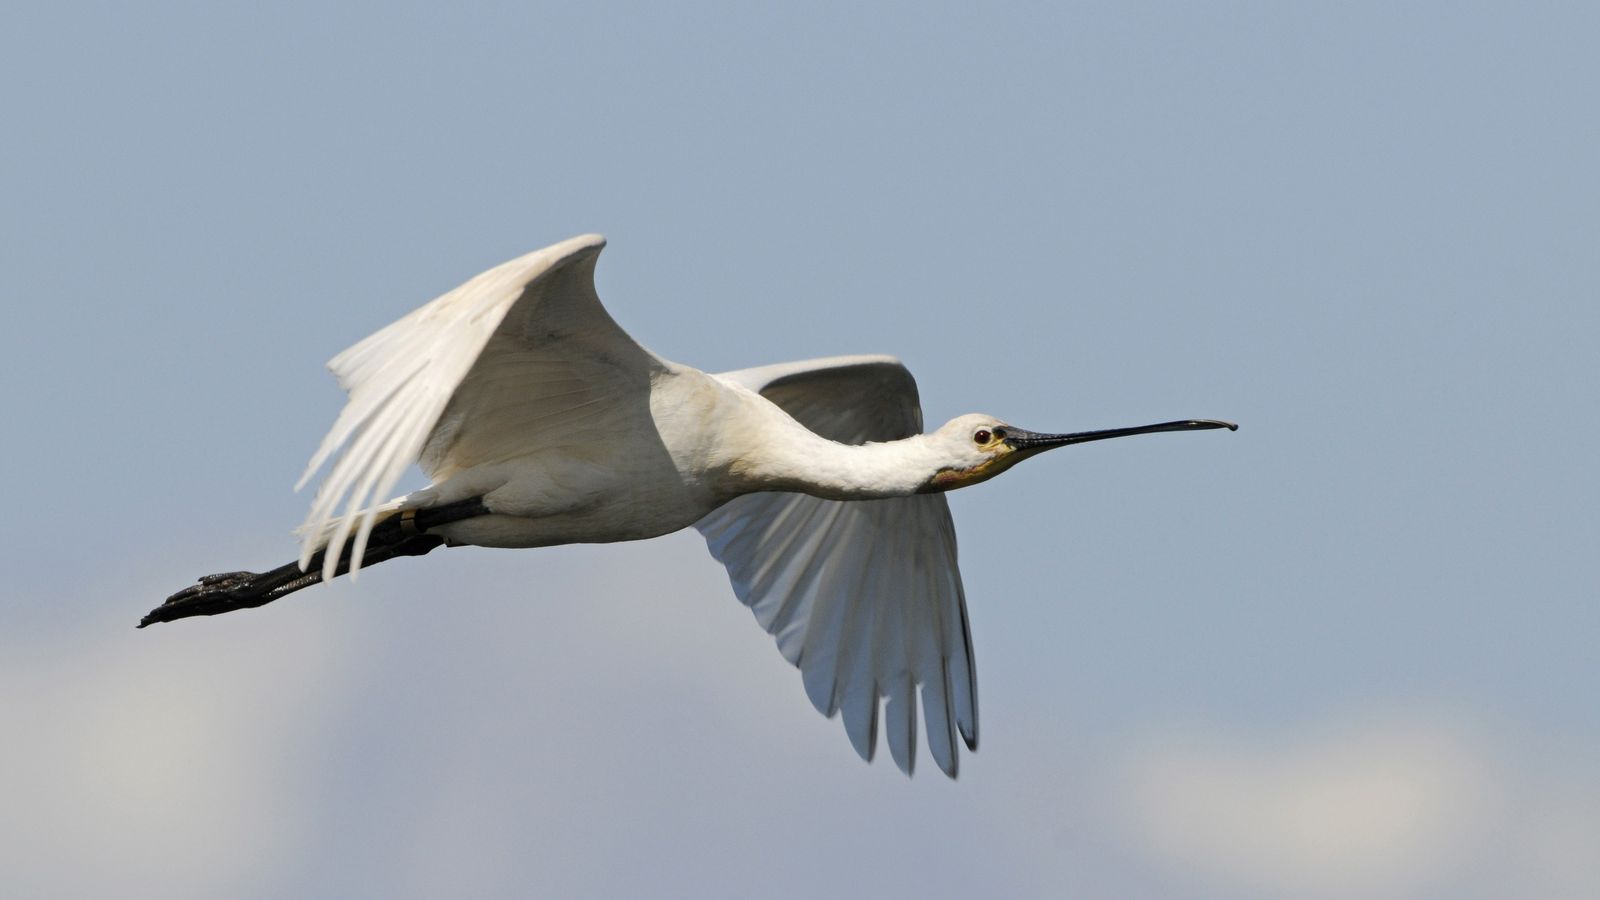 The impressive and elegant spoonbill in flight over marshland.